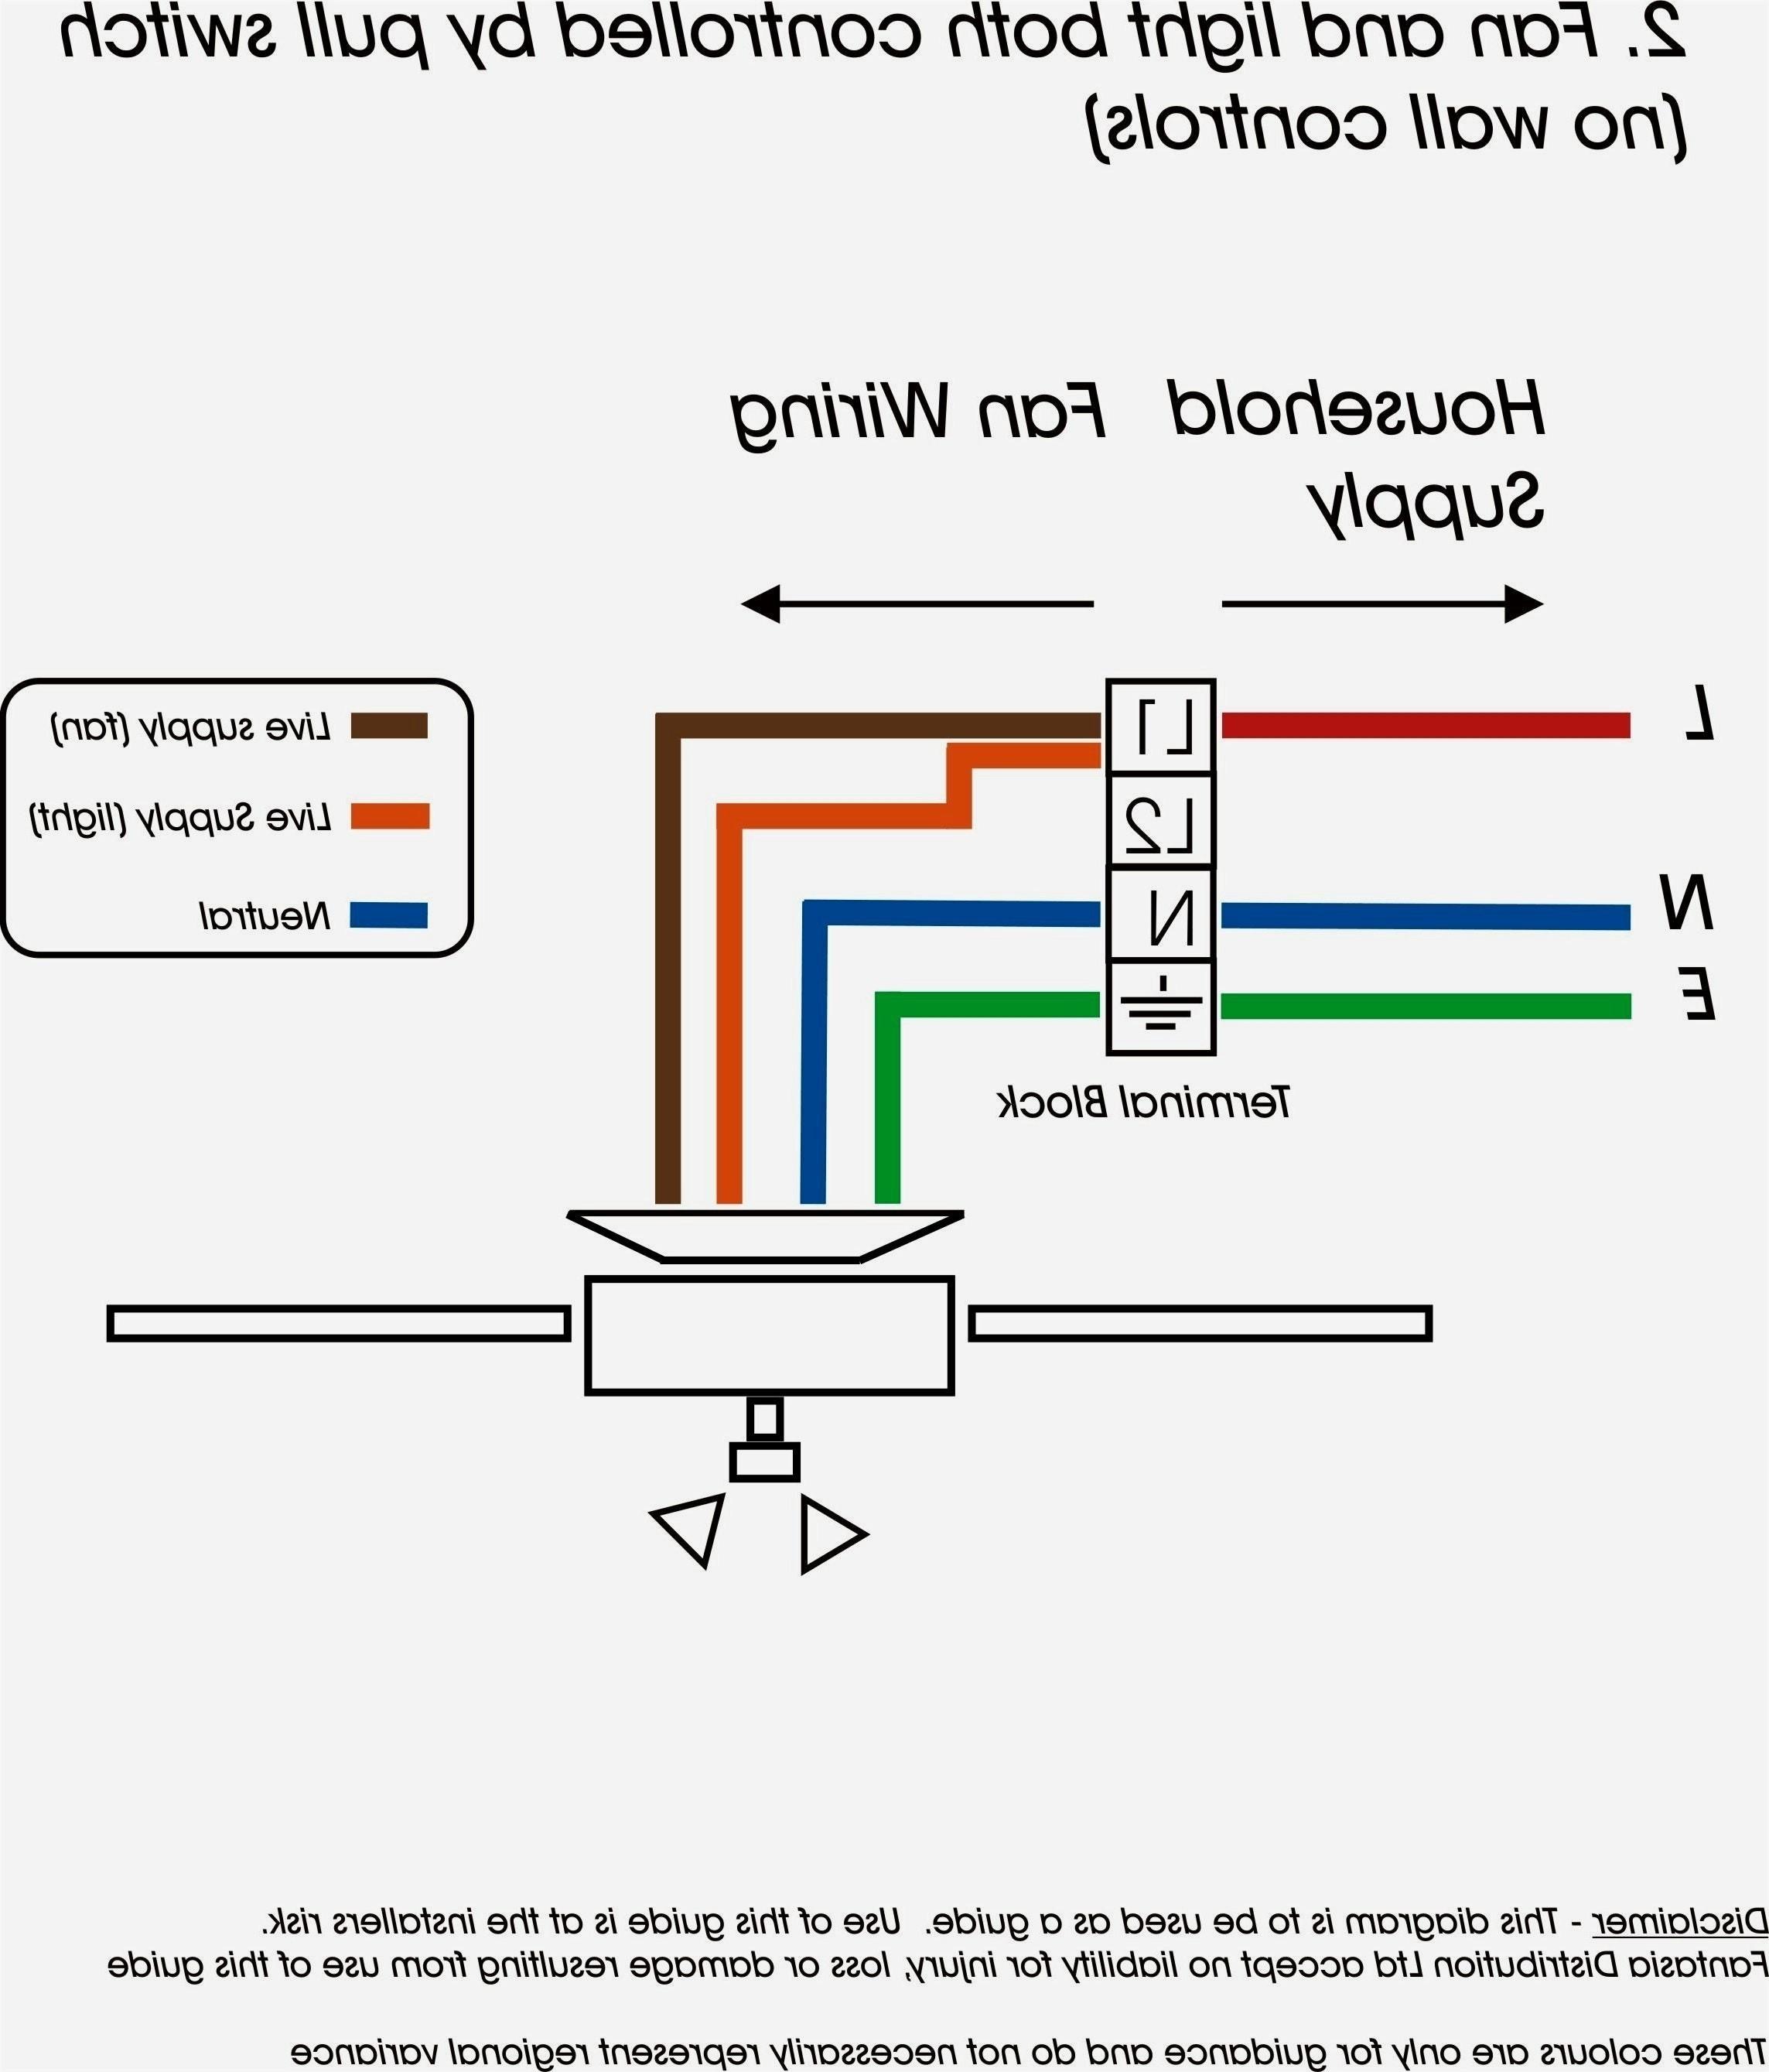 lithonia emergency light wiring diagram Download-Wiring Diagram Pics Detail Name lithonia lighting 5-m